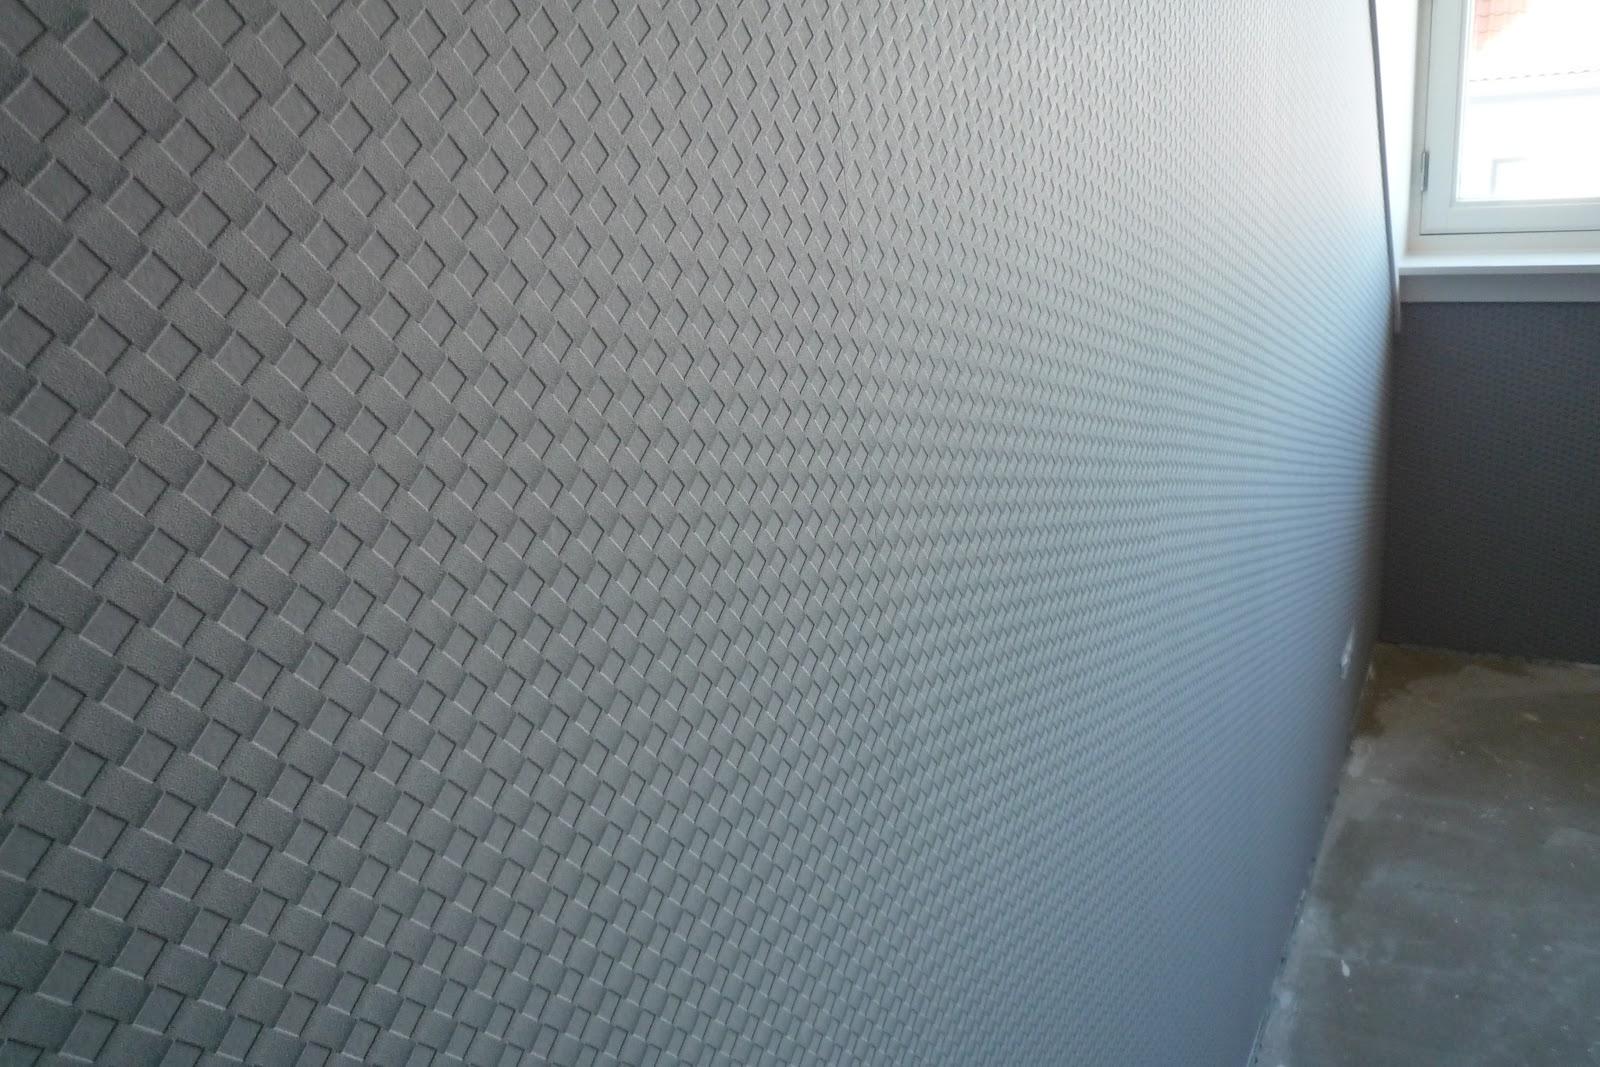 Aria goes   sjaak goud rijwoning: mei 2012